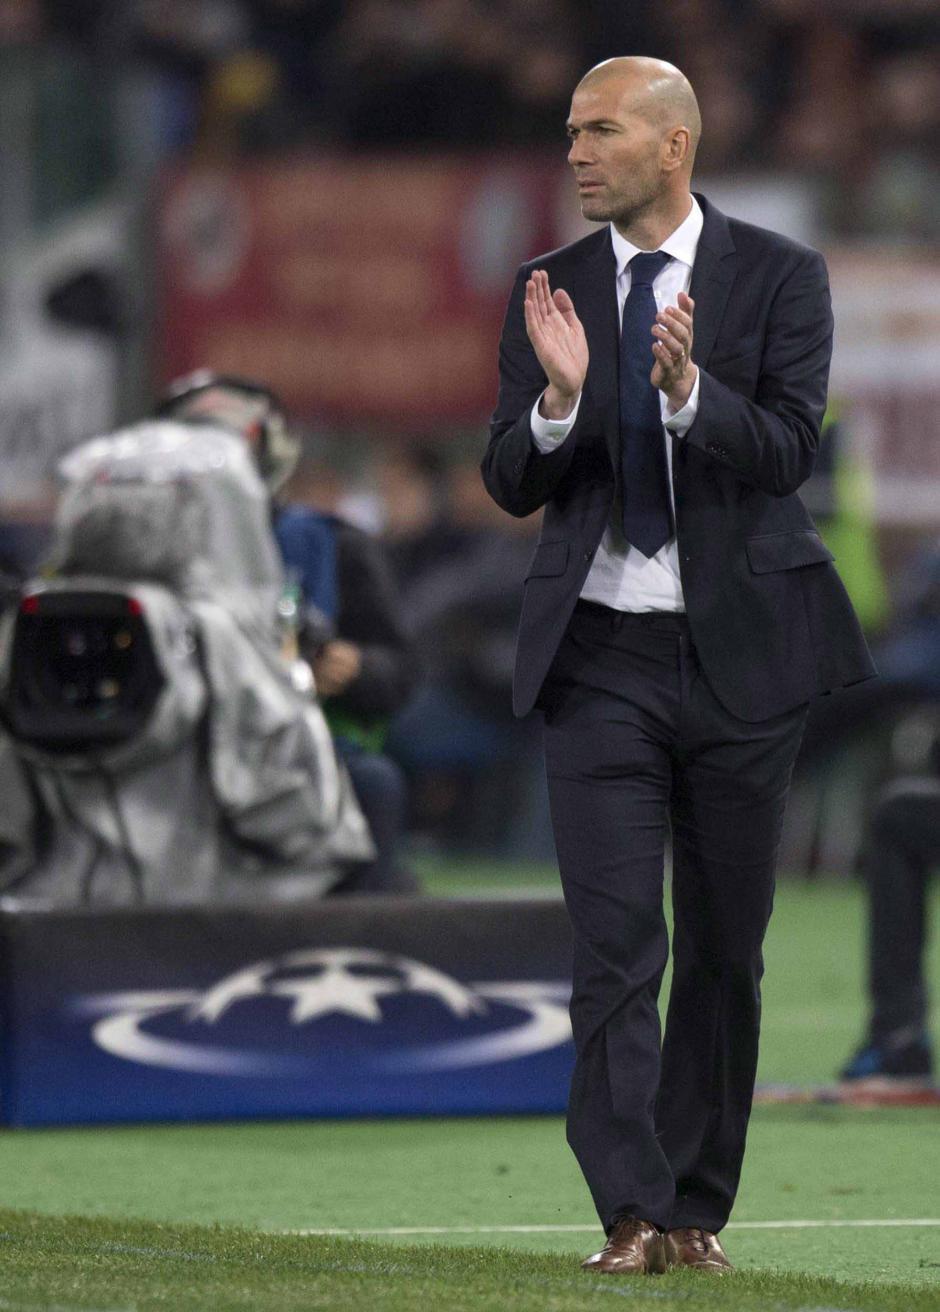 Zidane aprobó su primer gran examen en la Champions League, al superar a Roma.  (Foto: EFE)